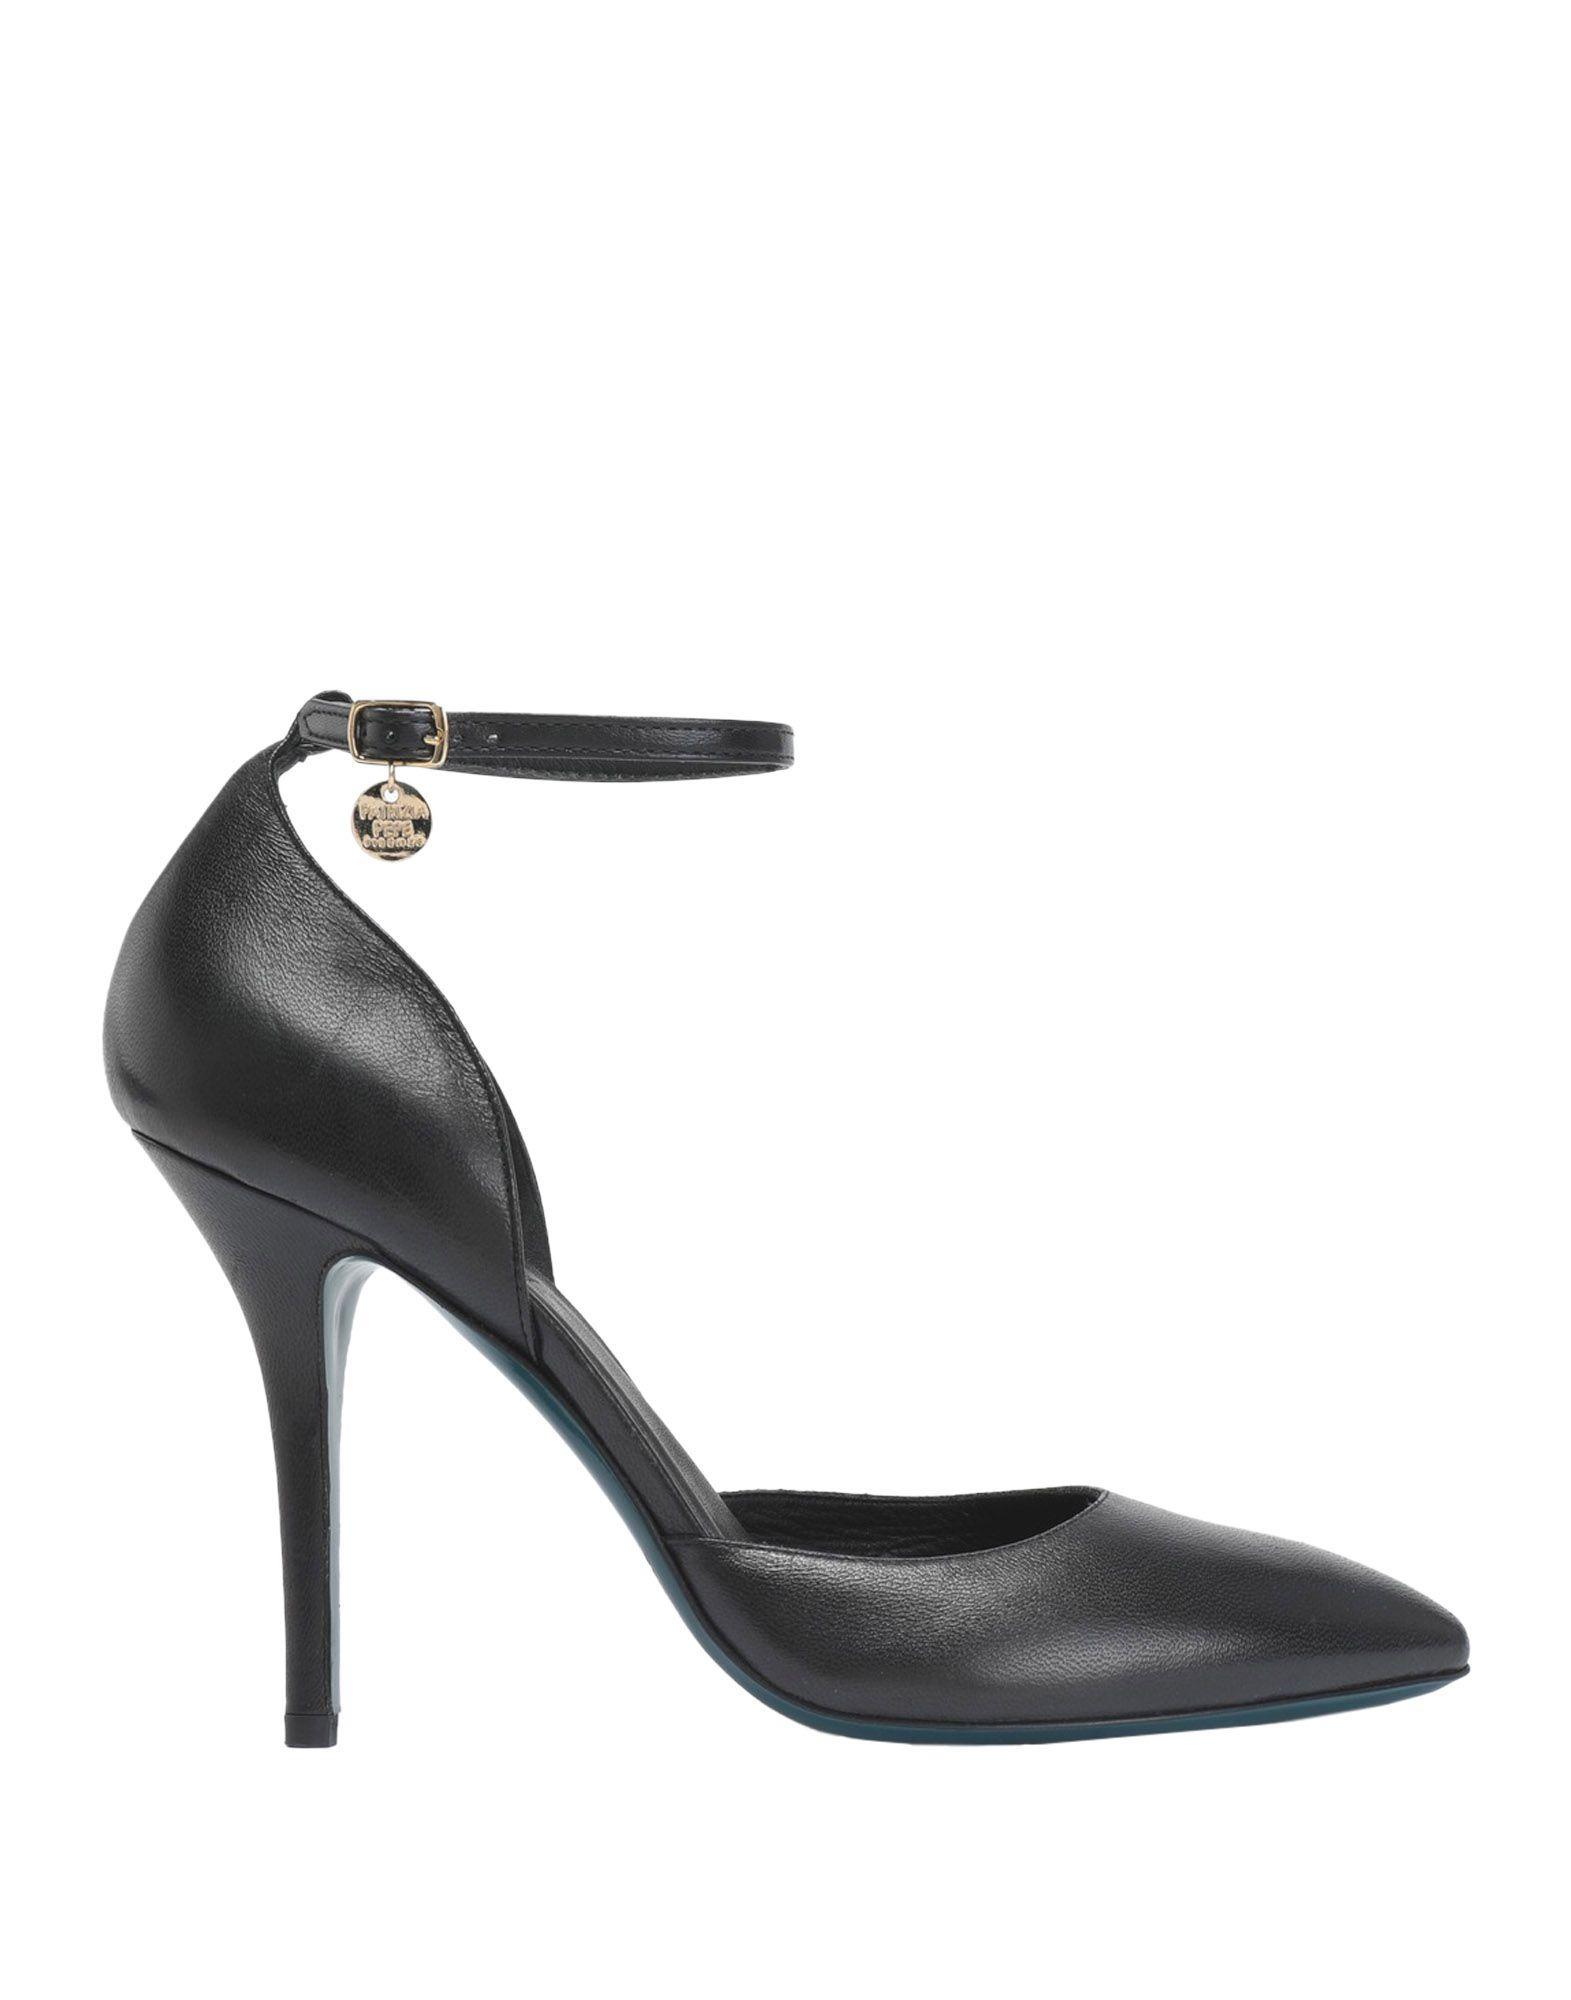 Patrizia Pepe Pumps Damen  11530293GC Gute Qualität beliebte Schuhe